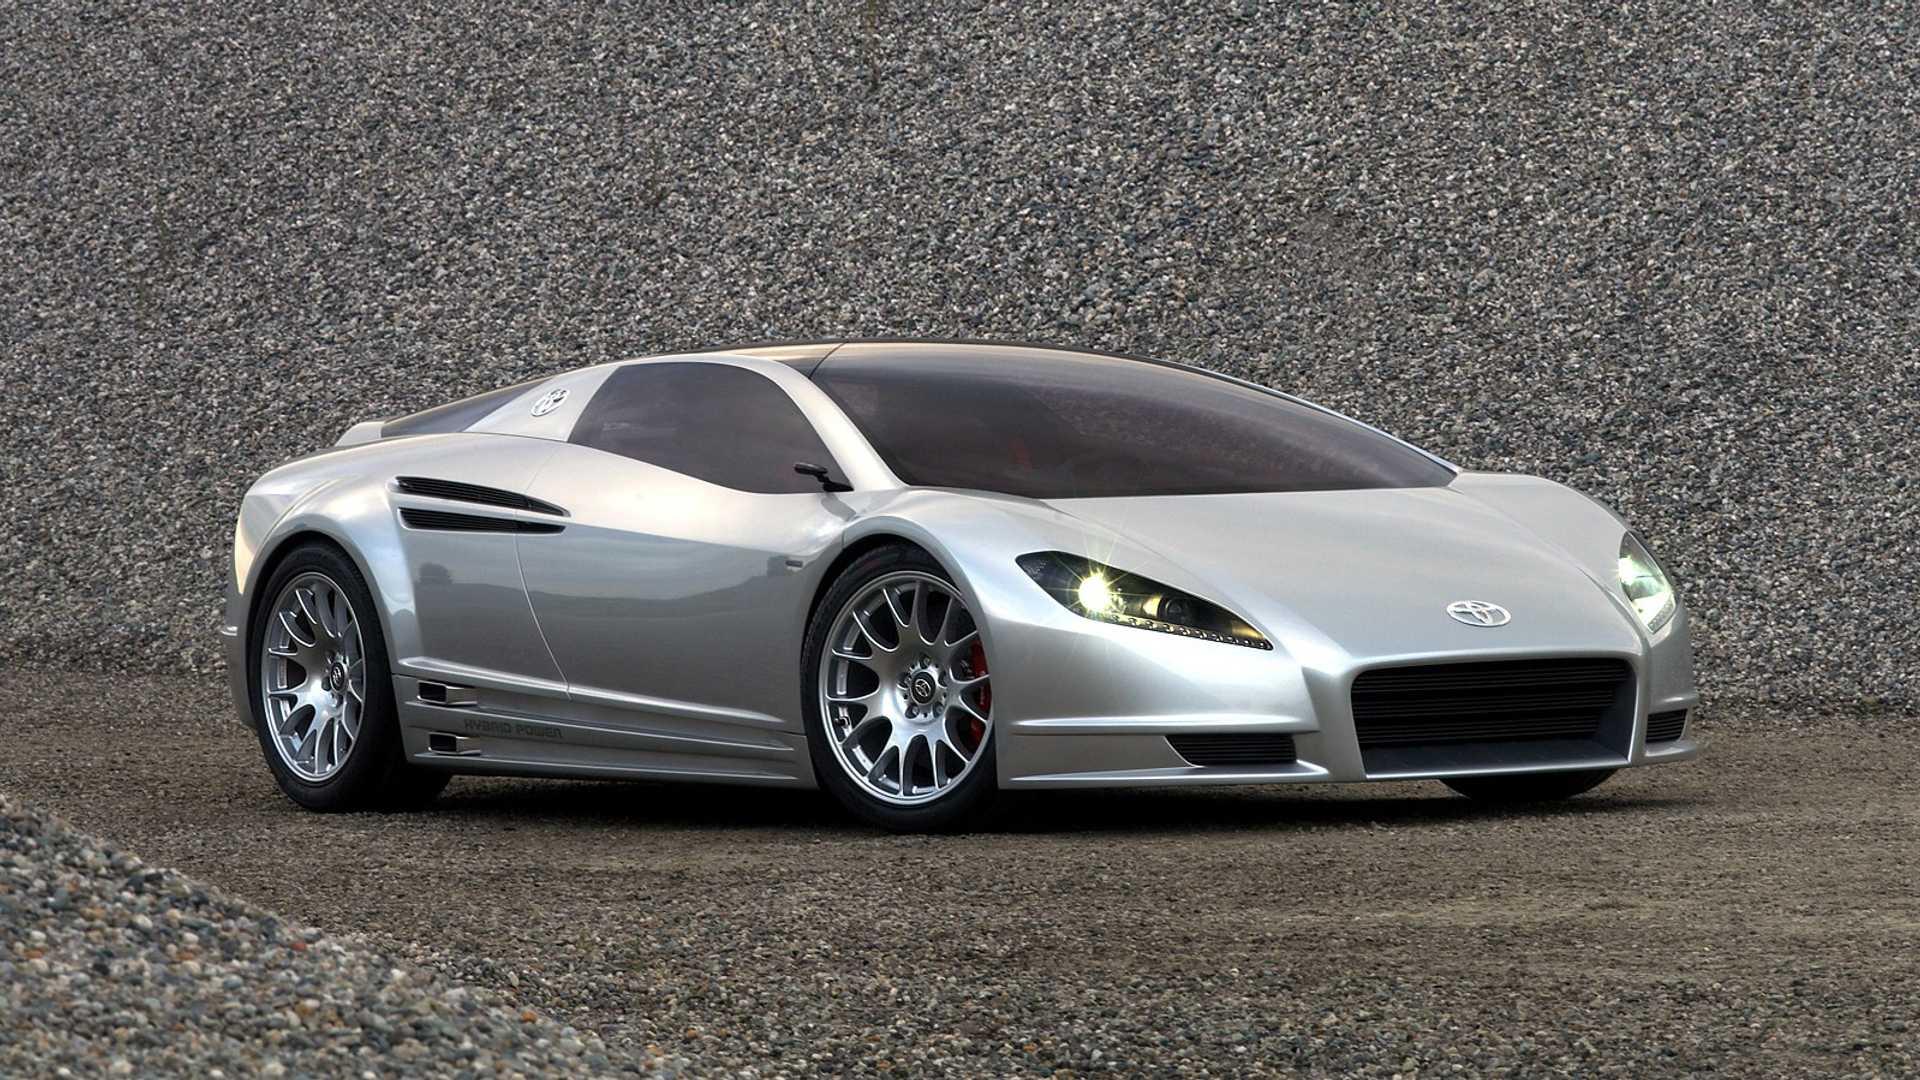 Toyota-Alessandro-Volta-concept-2004-18